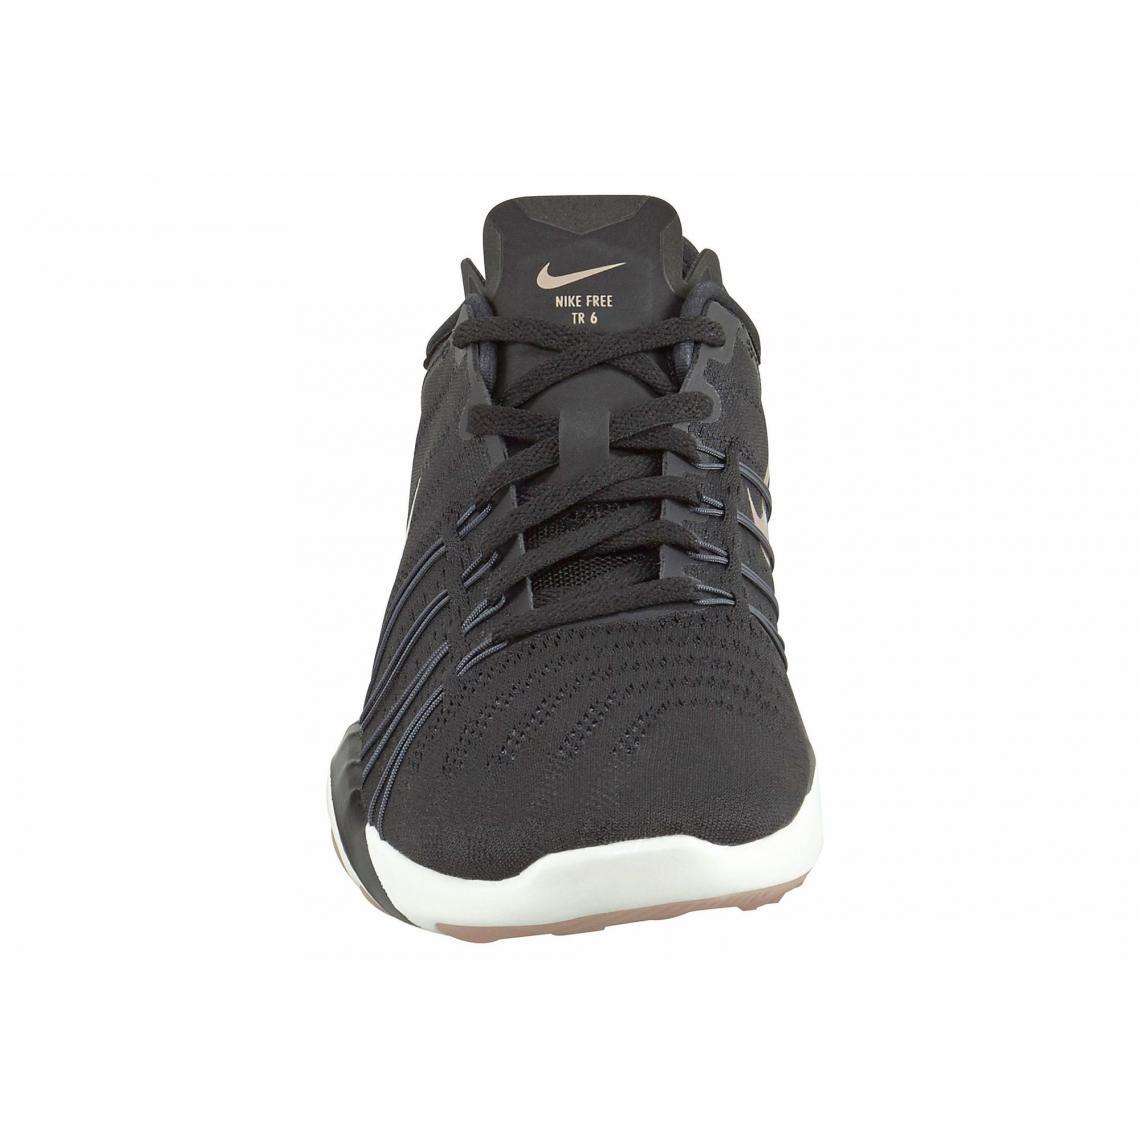 Sneakers Nike Cliquez l image pour l agrandir. Nike Free Trainer 6  chaussures fitness femme ... e484f31ba33